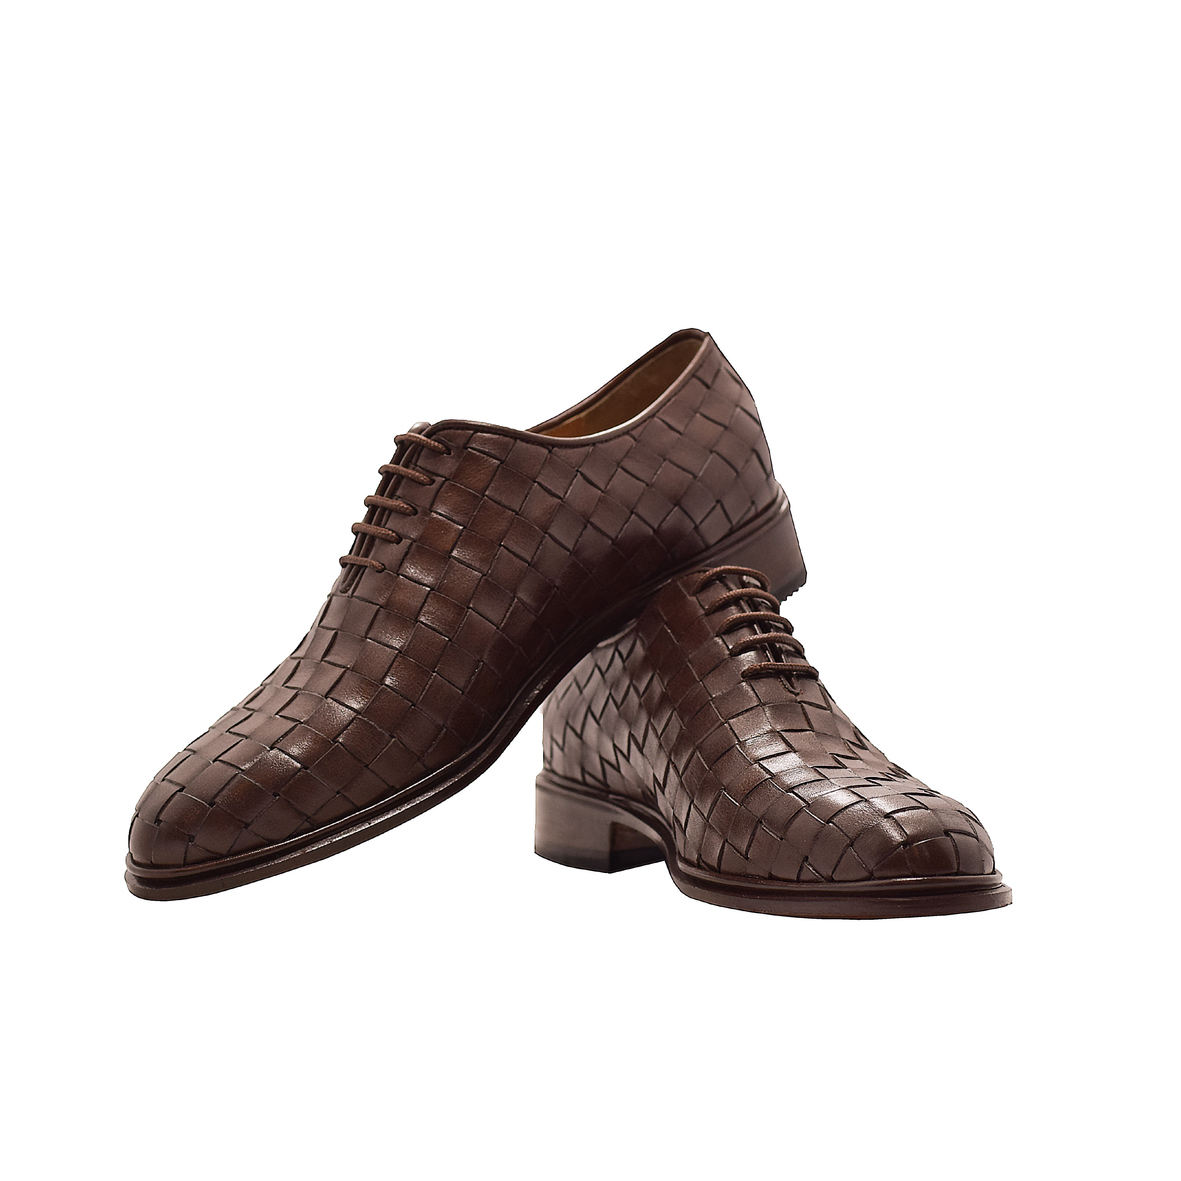 کفش مردانه دگرمان مدل بوریا کد deg.2br2102 -  - 8